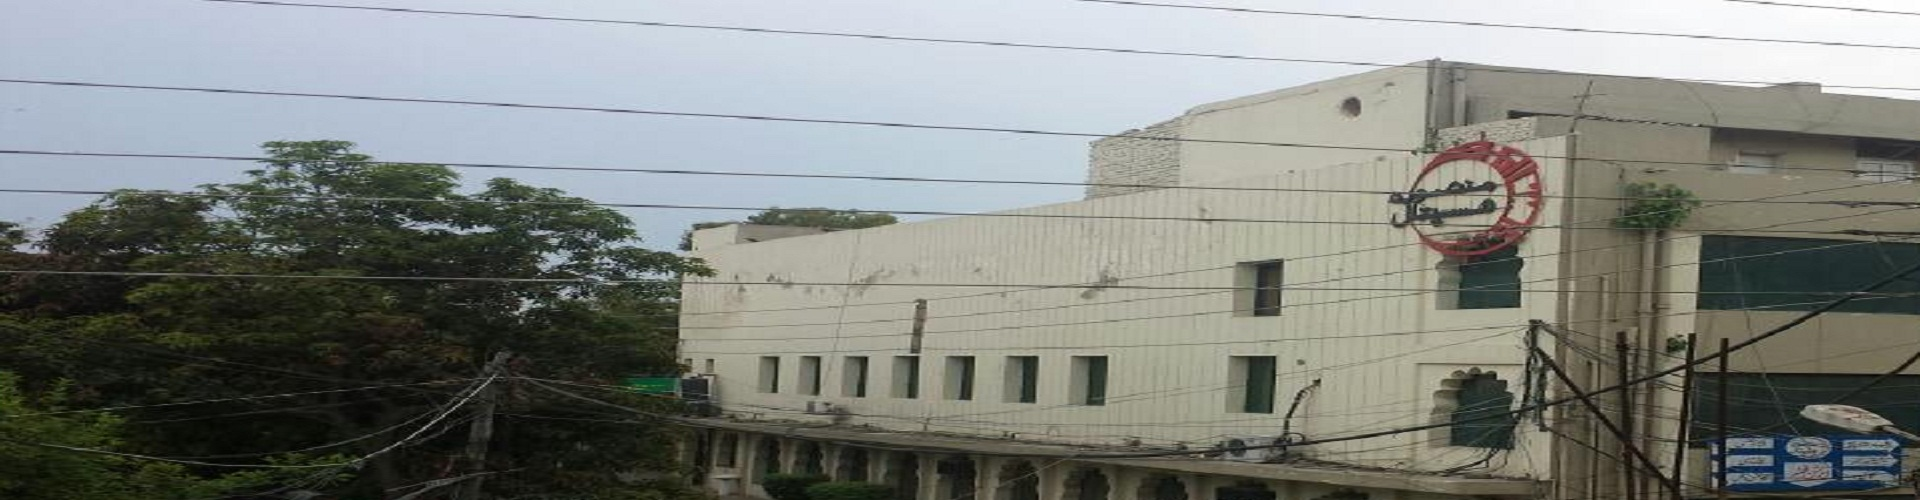 Mansoora hospital front